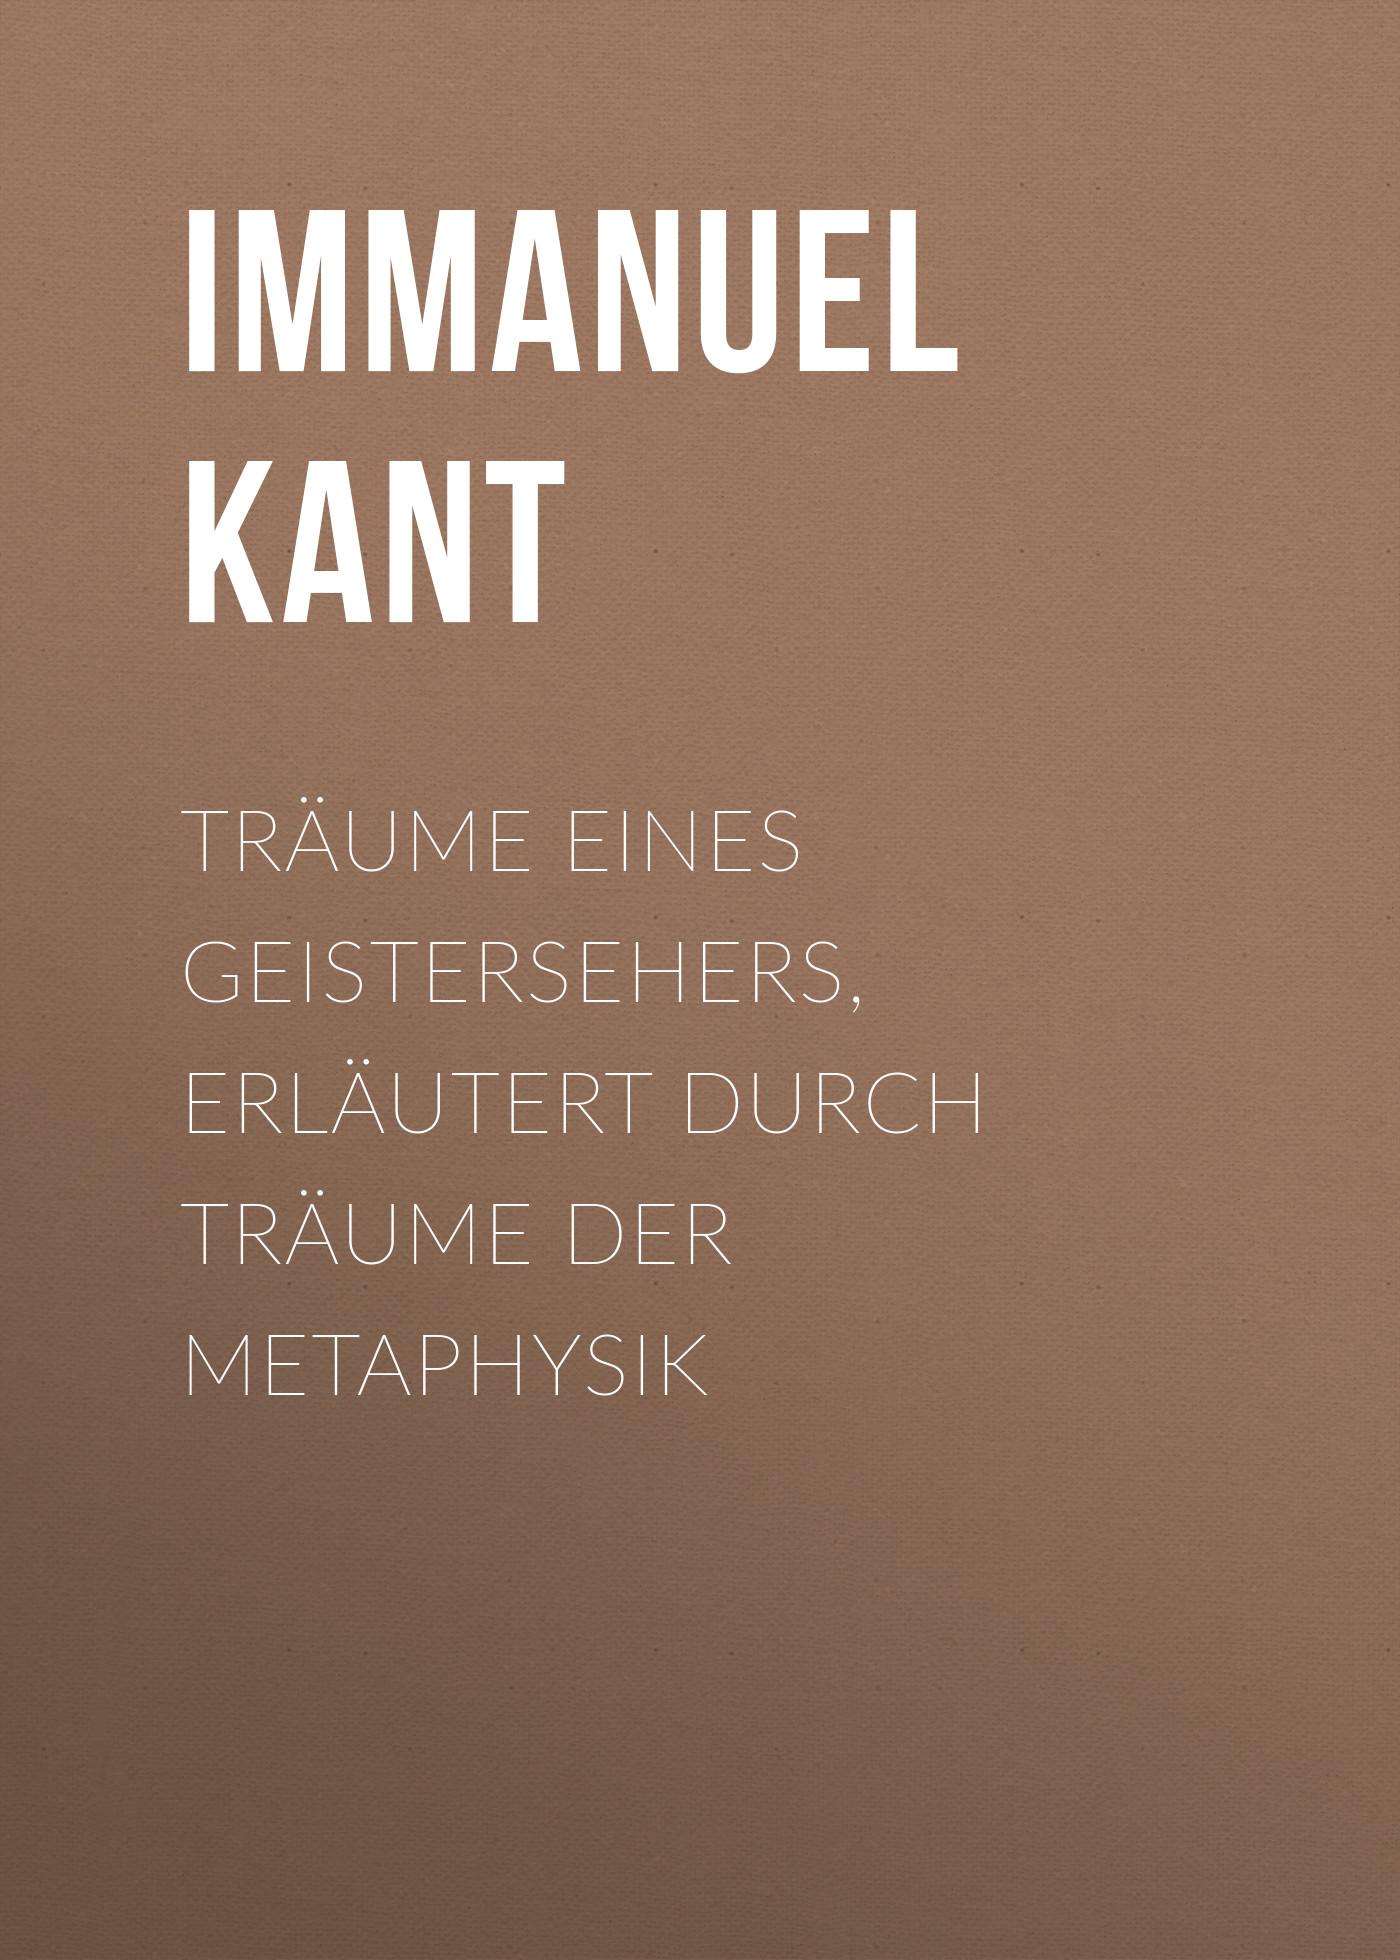 цена Иммануил Кант Träume eines Geistersehers, erläutert durch Träume der Metaphysik онлайн в 2017 году